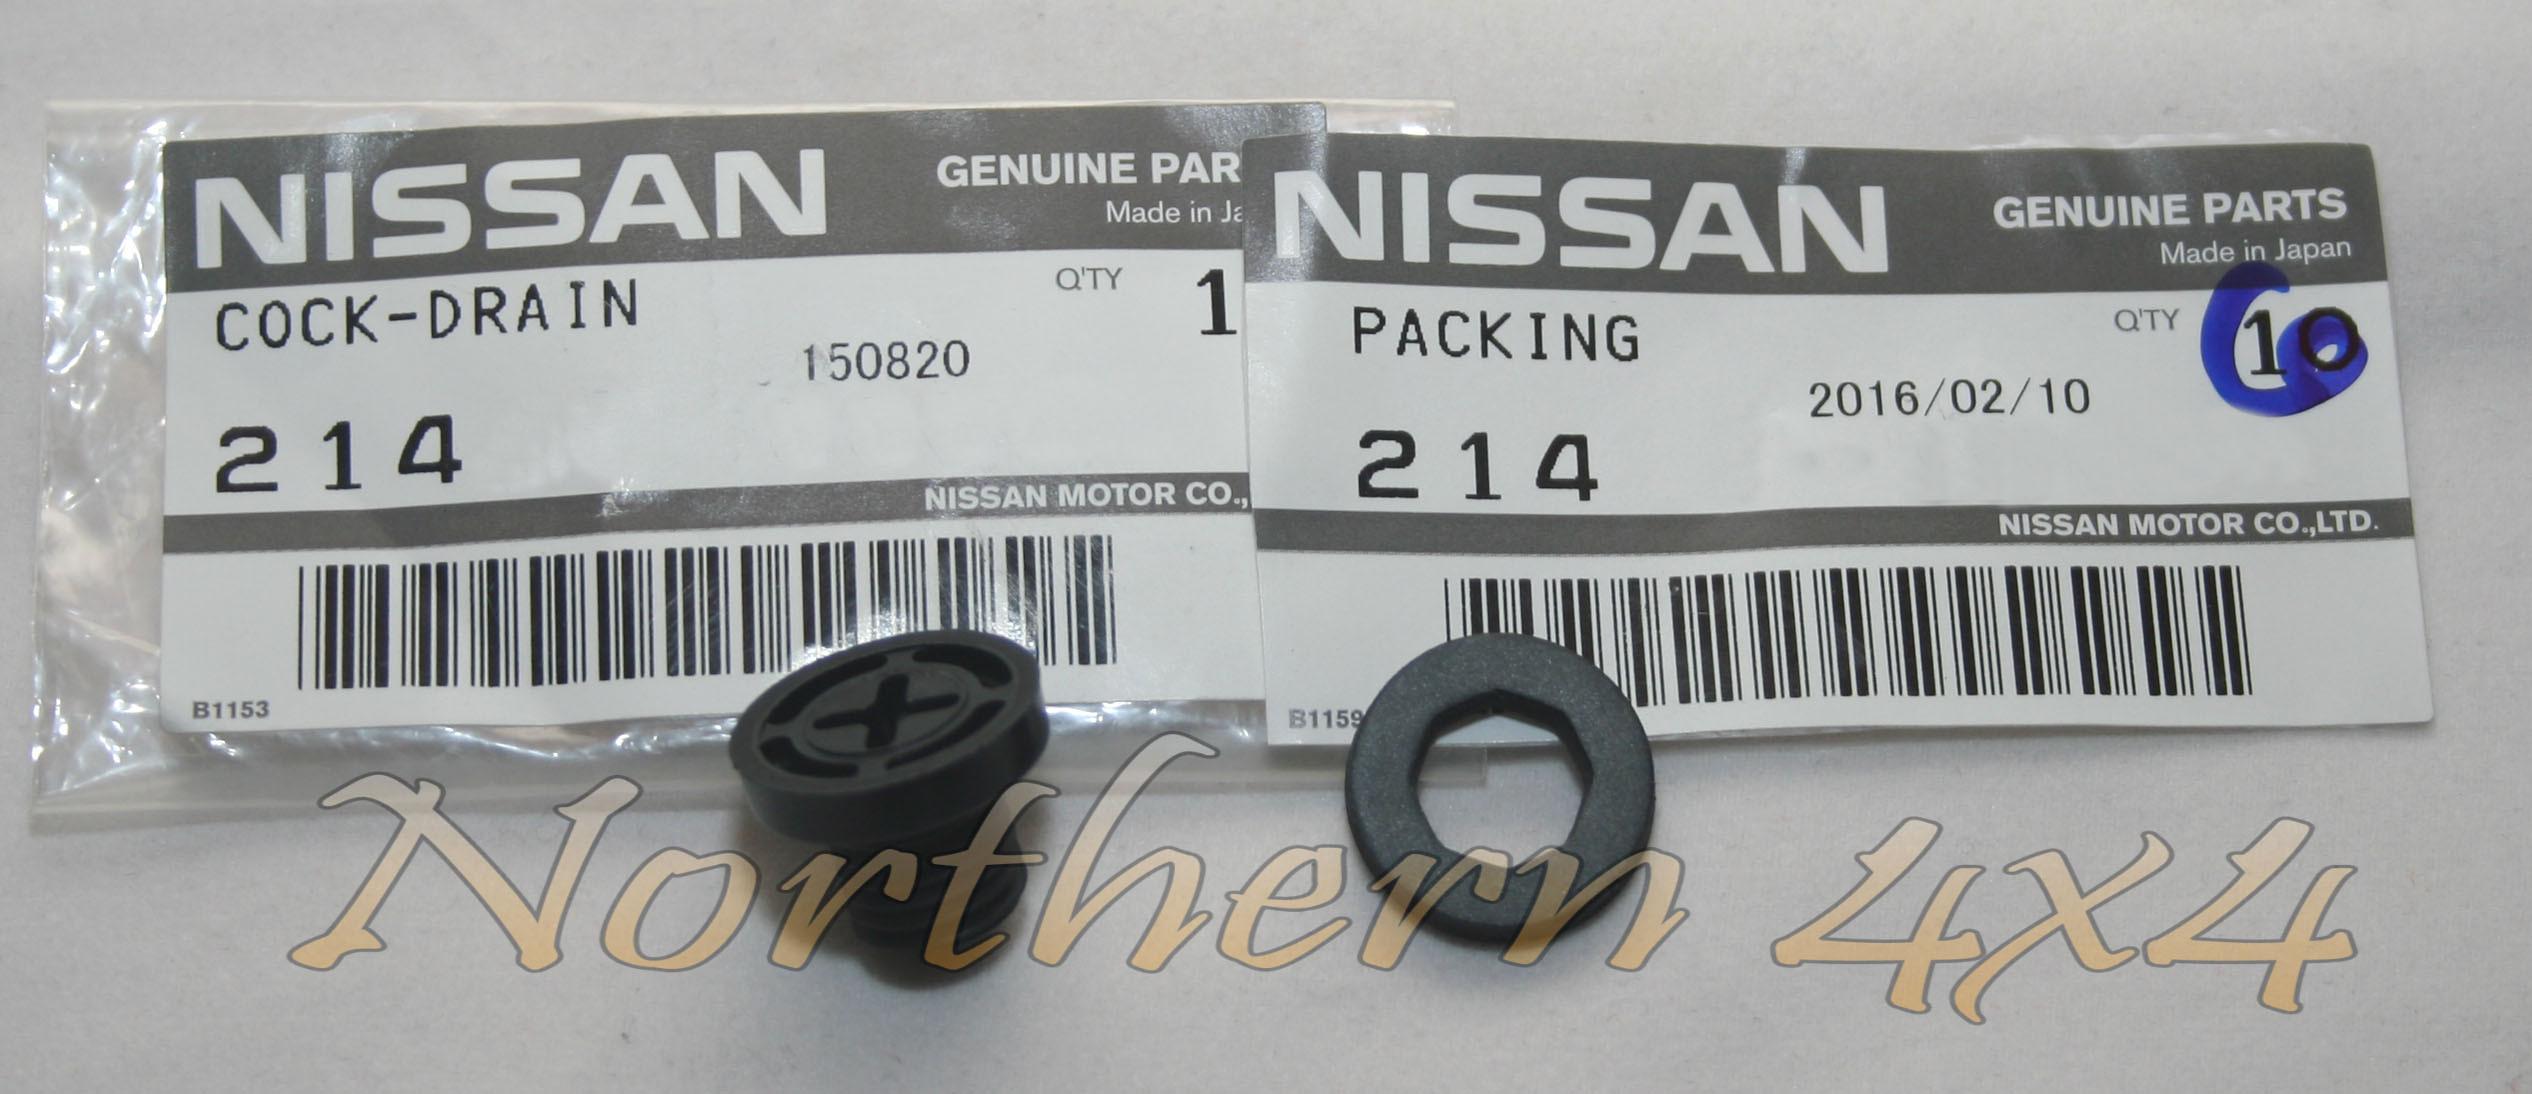 Genuine Nissan Radiator Drain Plug Gasket 21481-18000